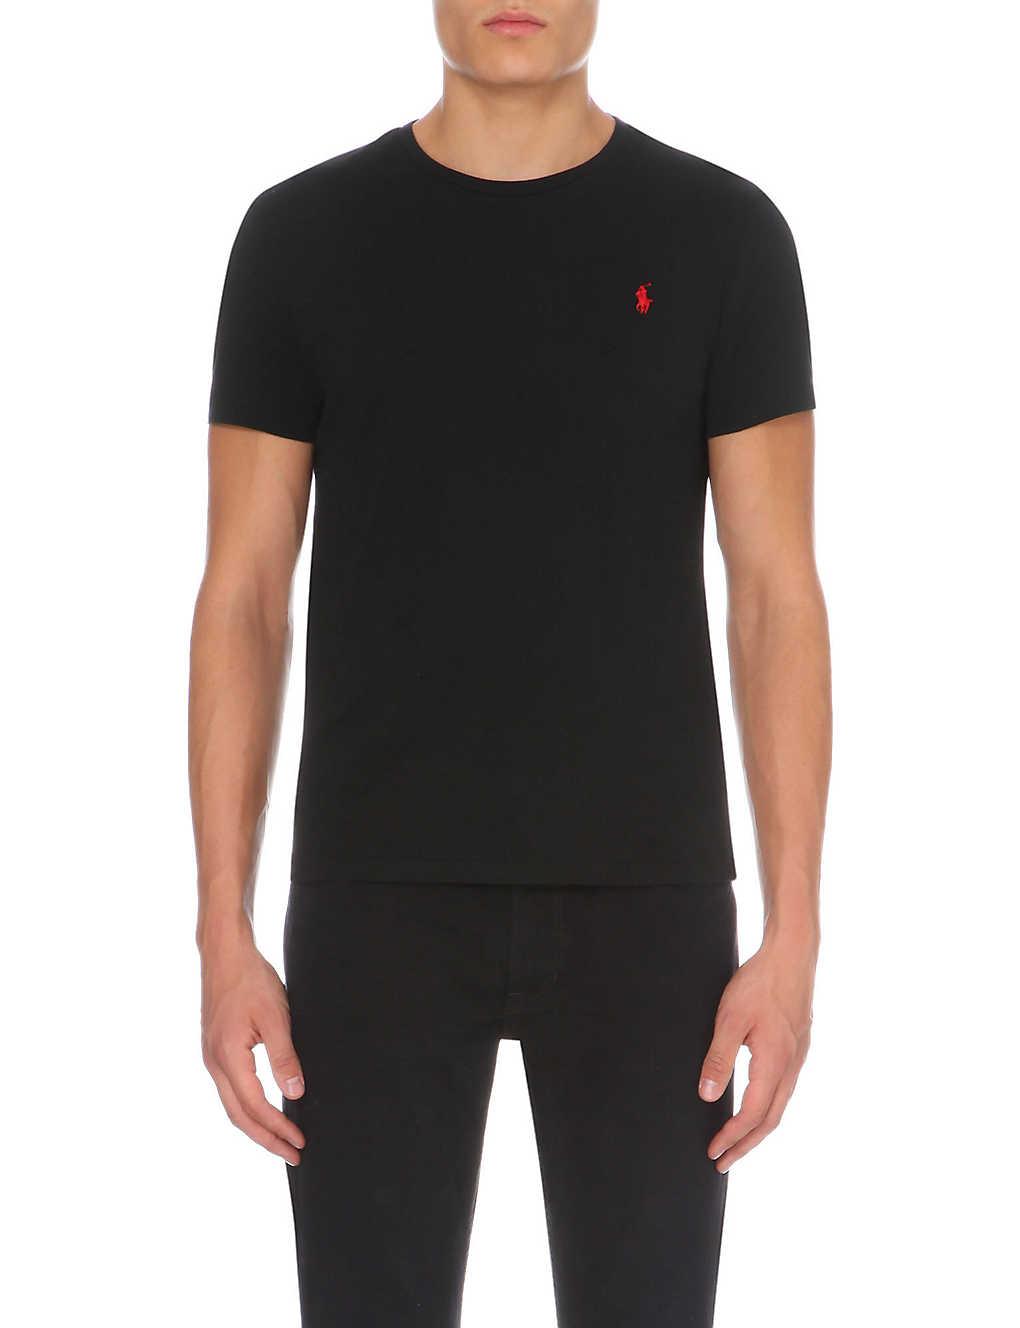 Jay z black t shirt white cross - Polo Ralph Lauren Logo Embroidered Cotton Jersey T Shirt